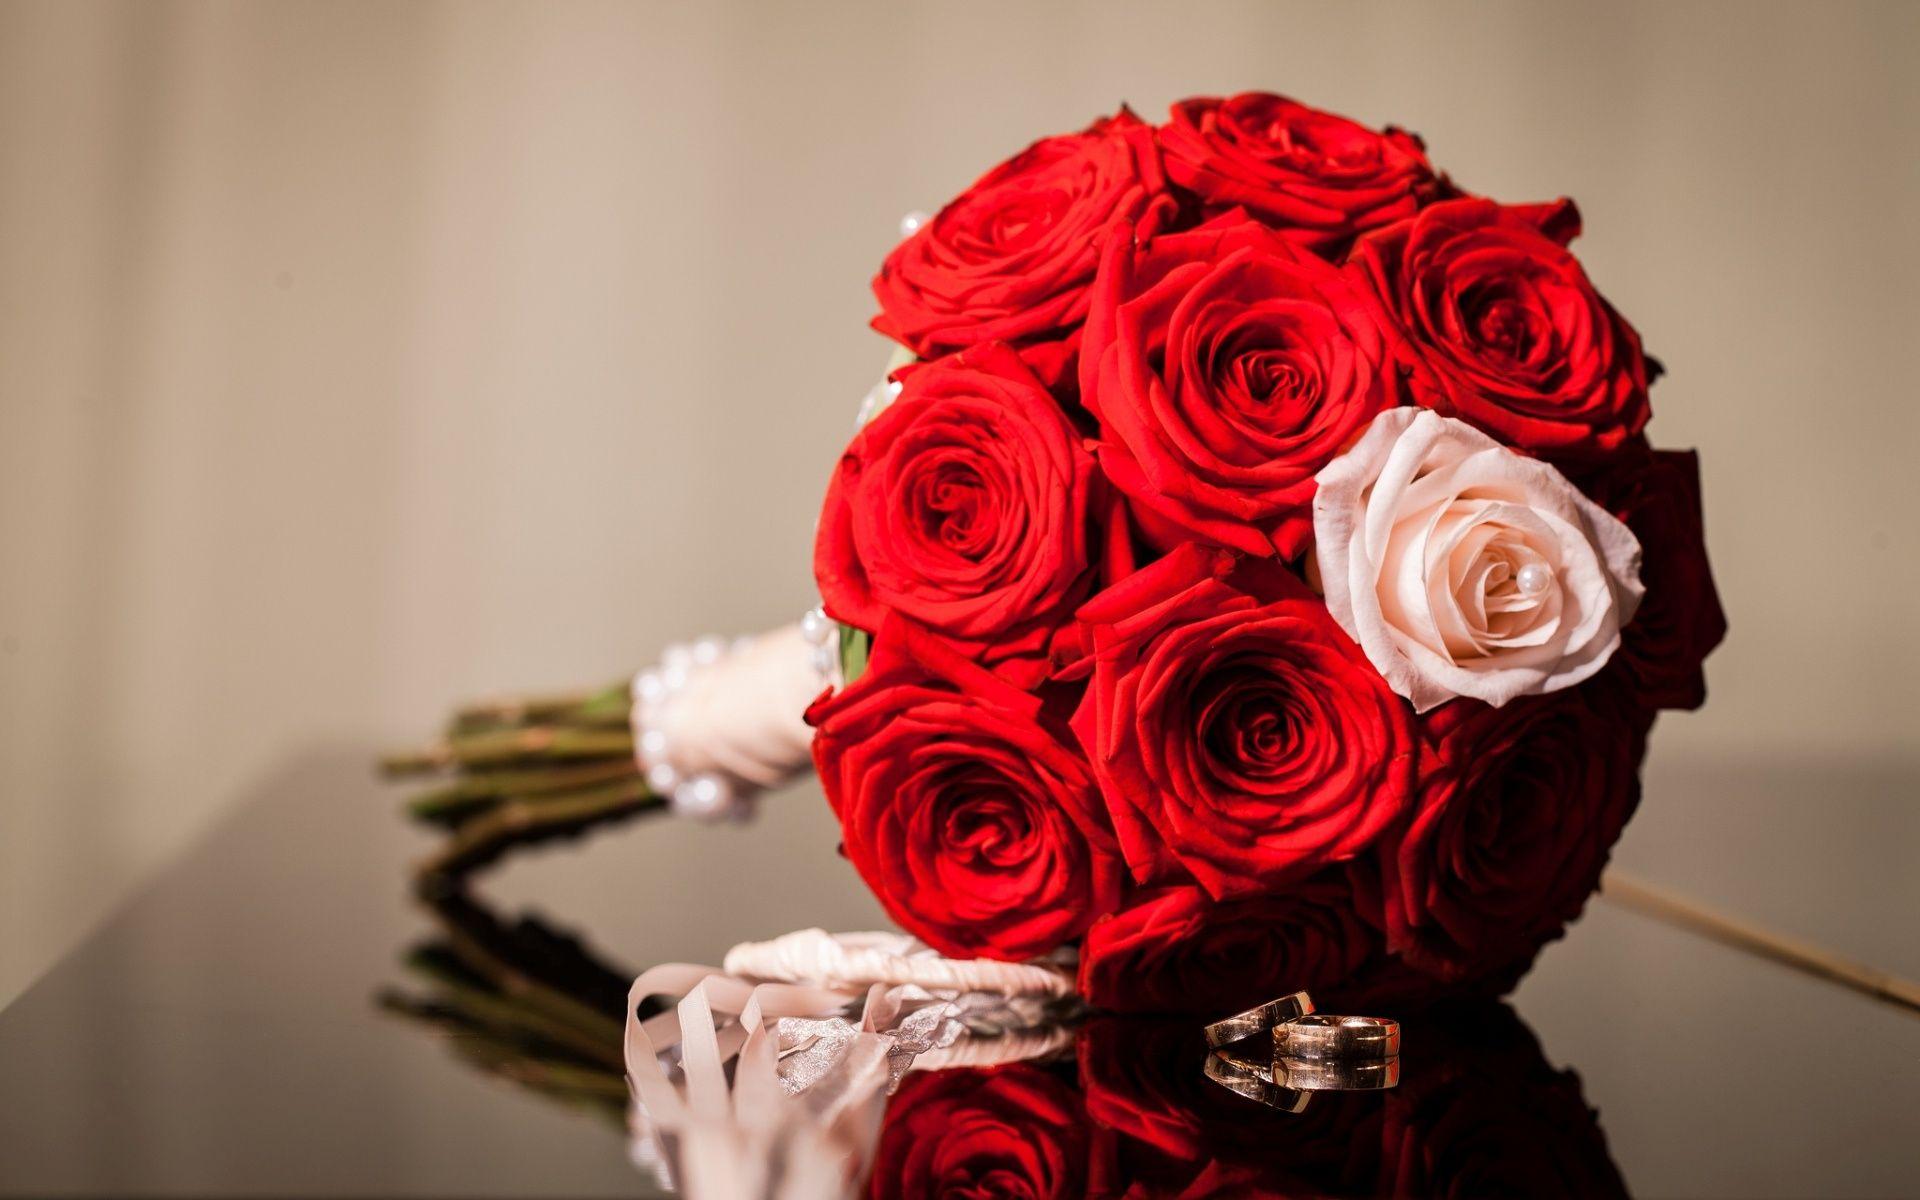 Best Wallpaper High Resolution Wedding - ff8a39865f26c3b821a4d6e844adc705  Pictures_773778.jpg